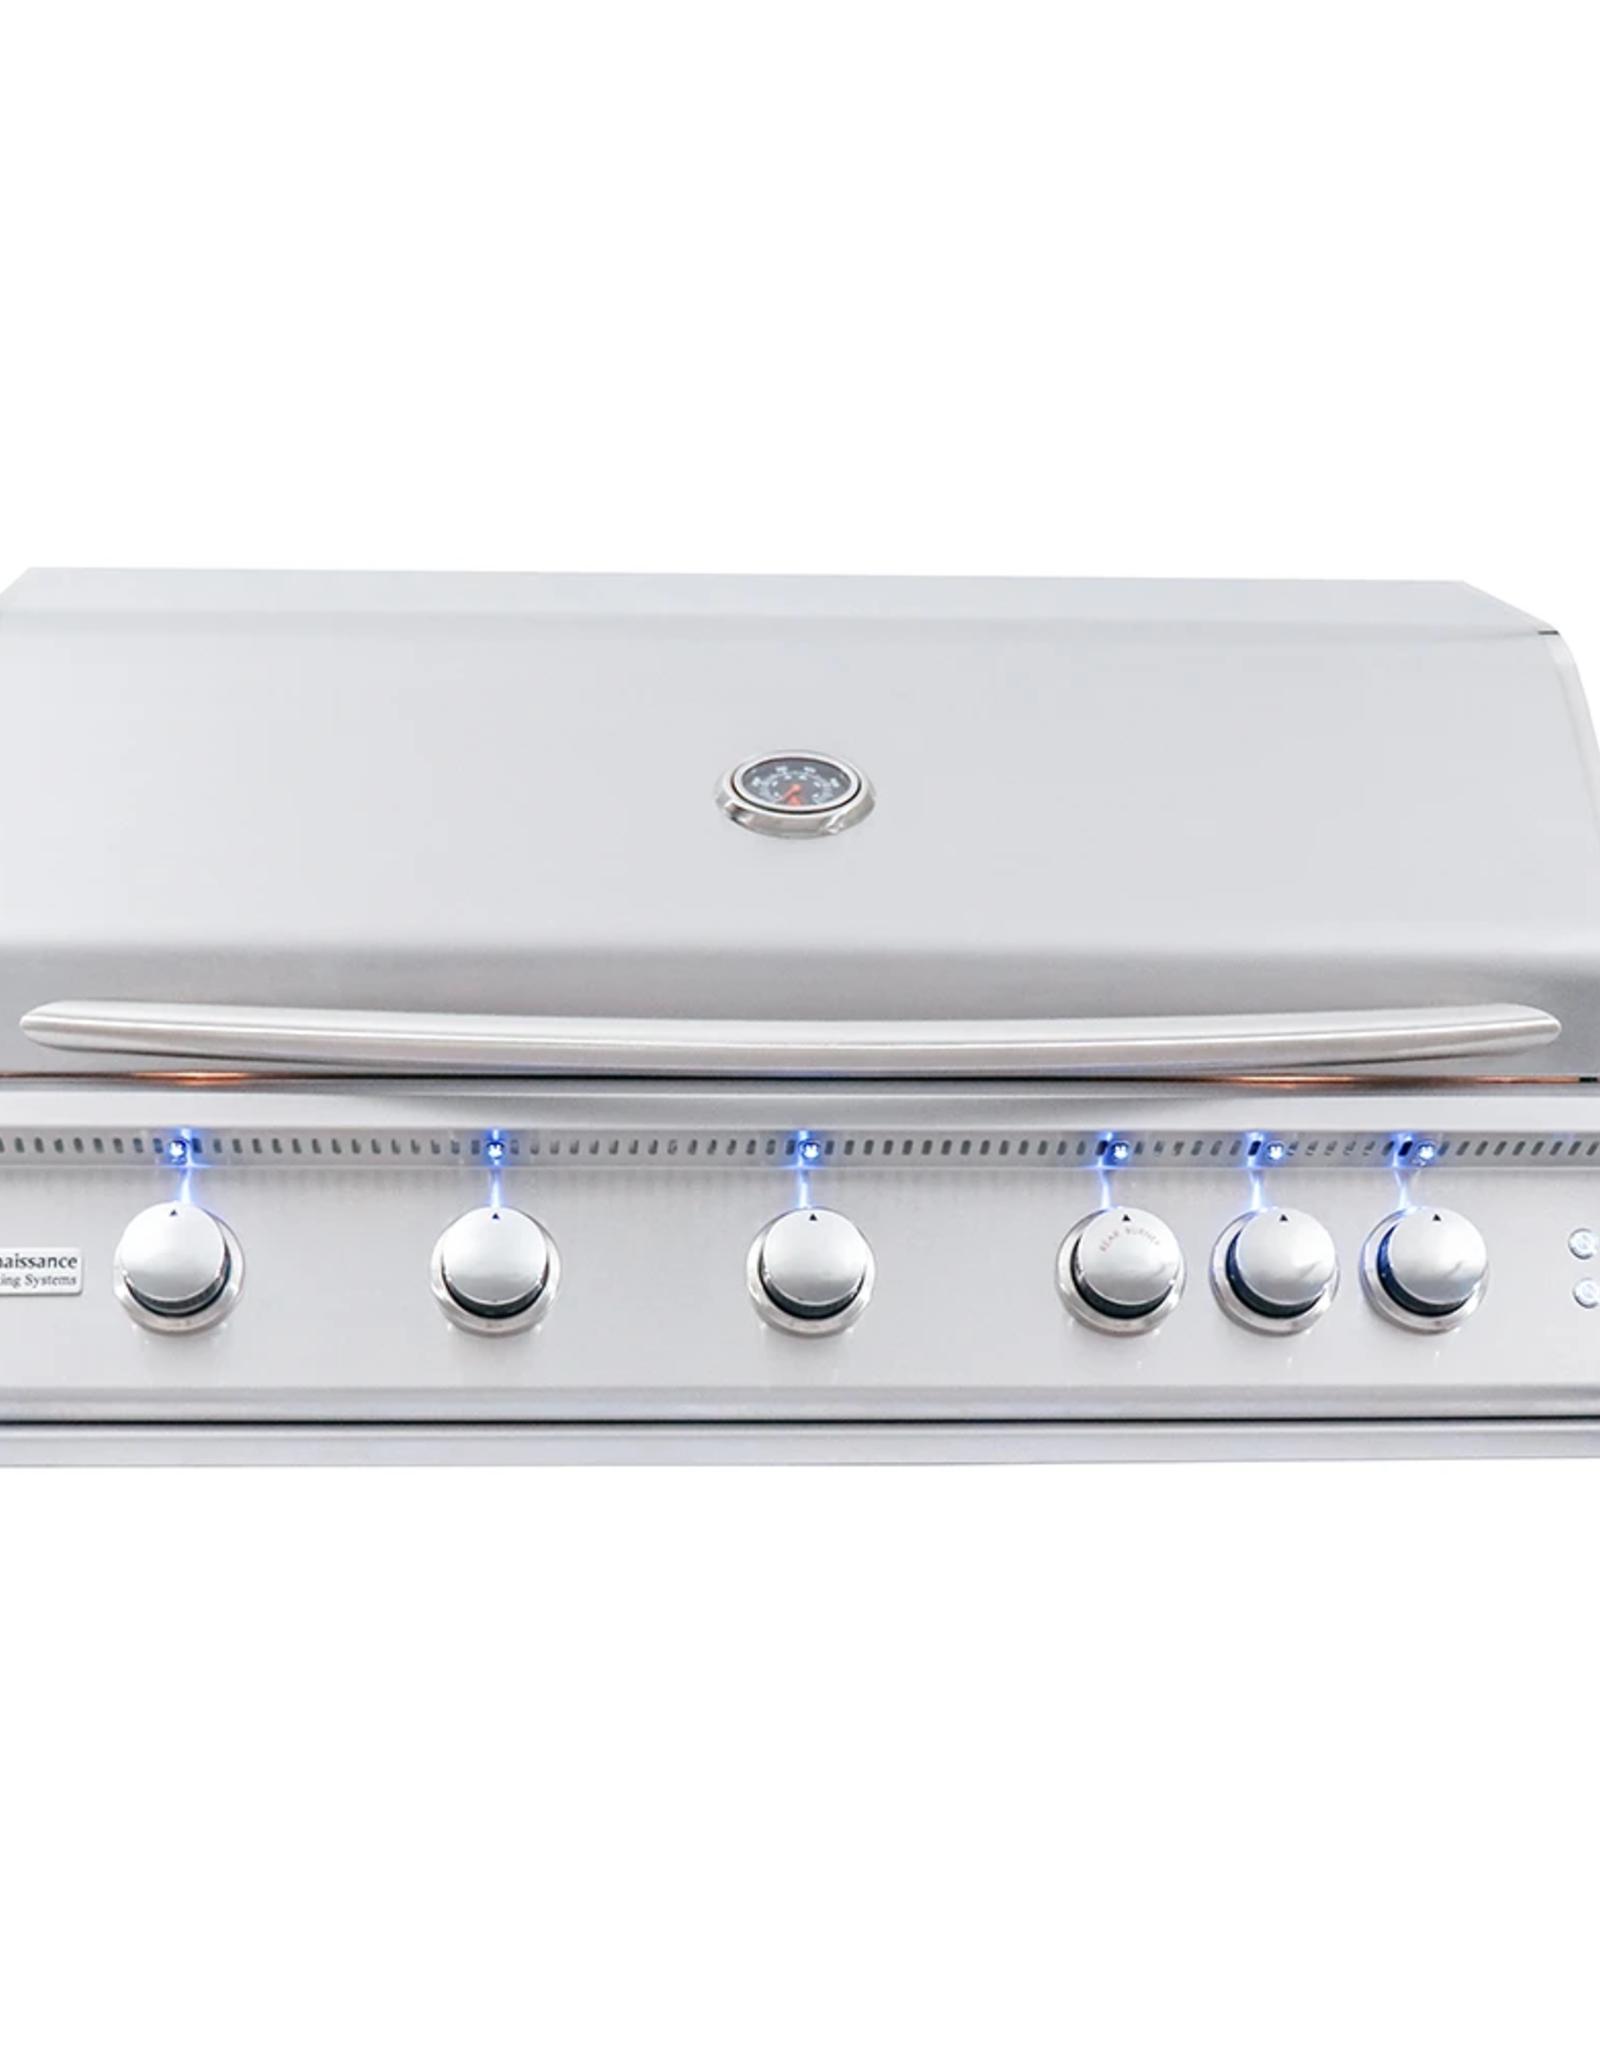 "Renaissance Cooking Systems Renaissance Cooking Systems 40"" Premier Drop-In Grill w/ LED Lights Propane  - RJC40AL"